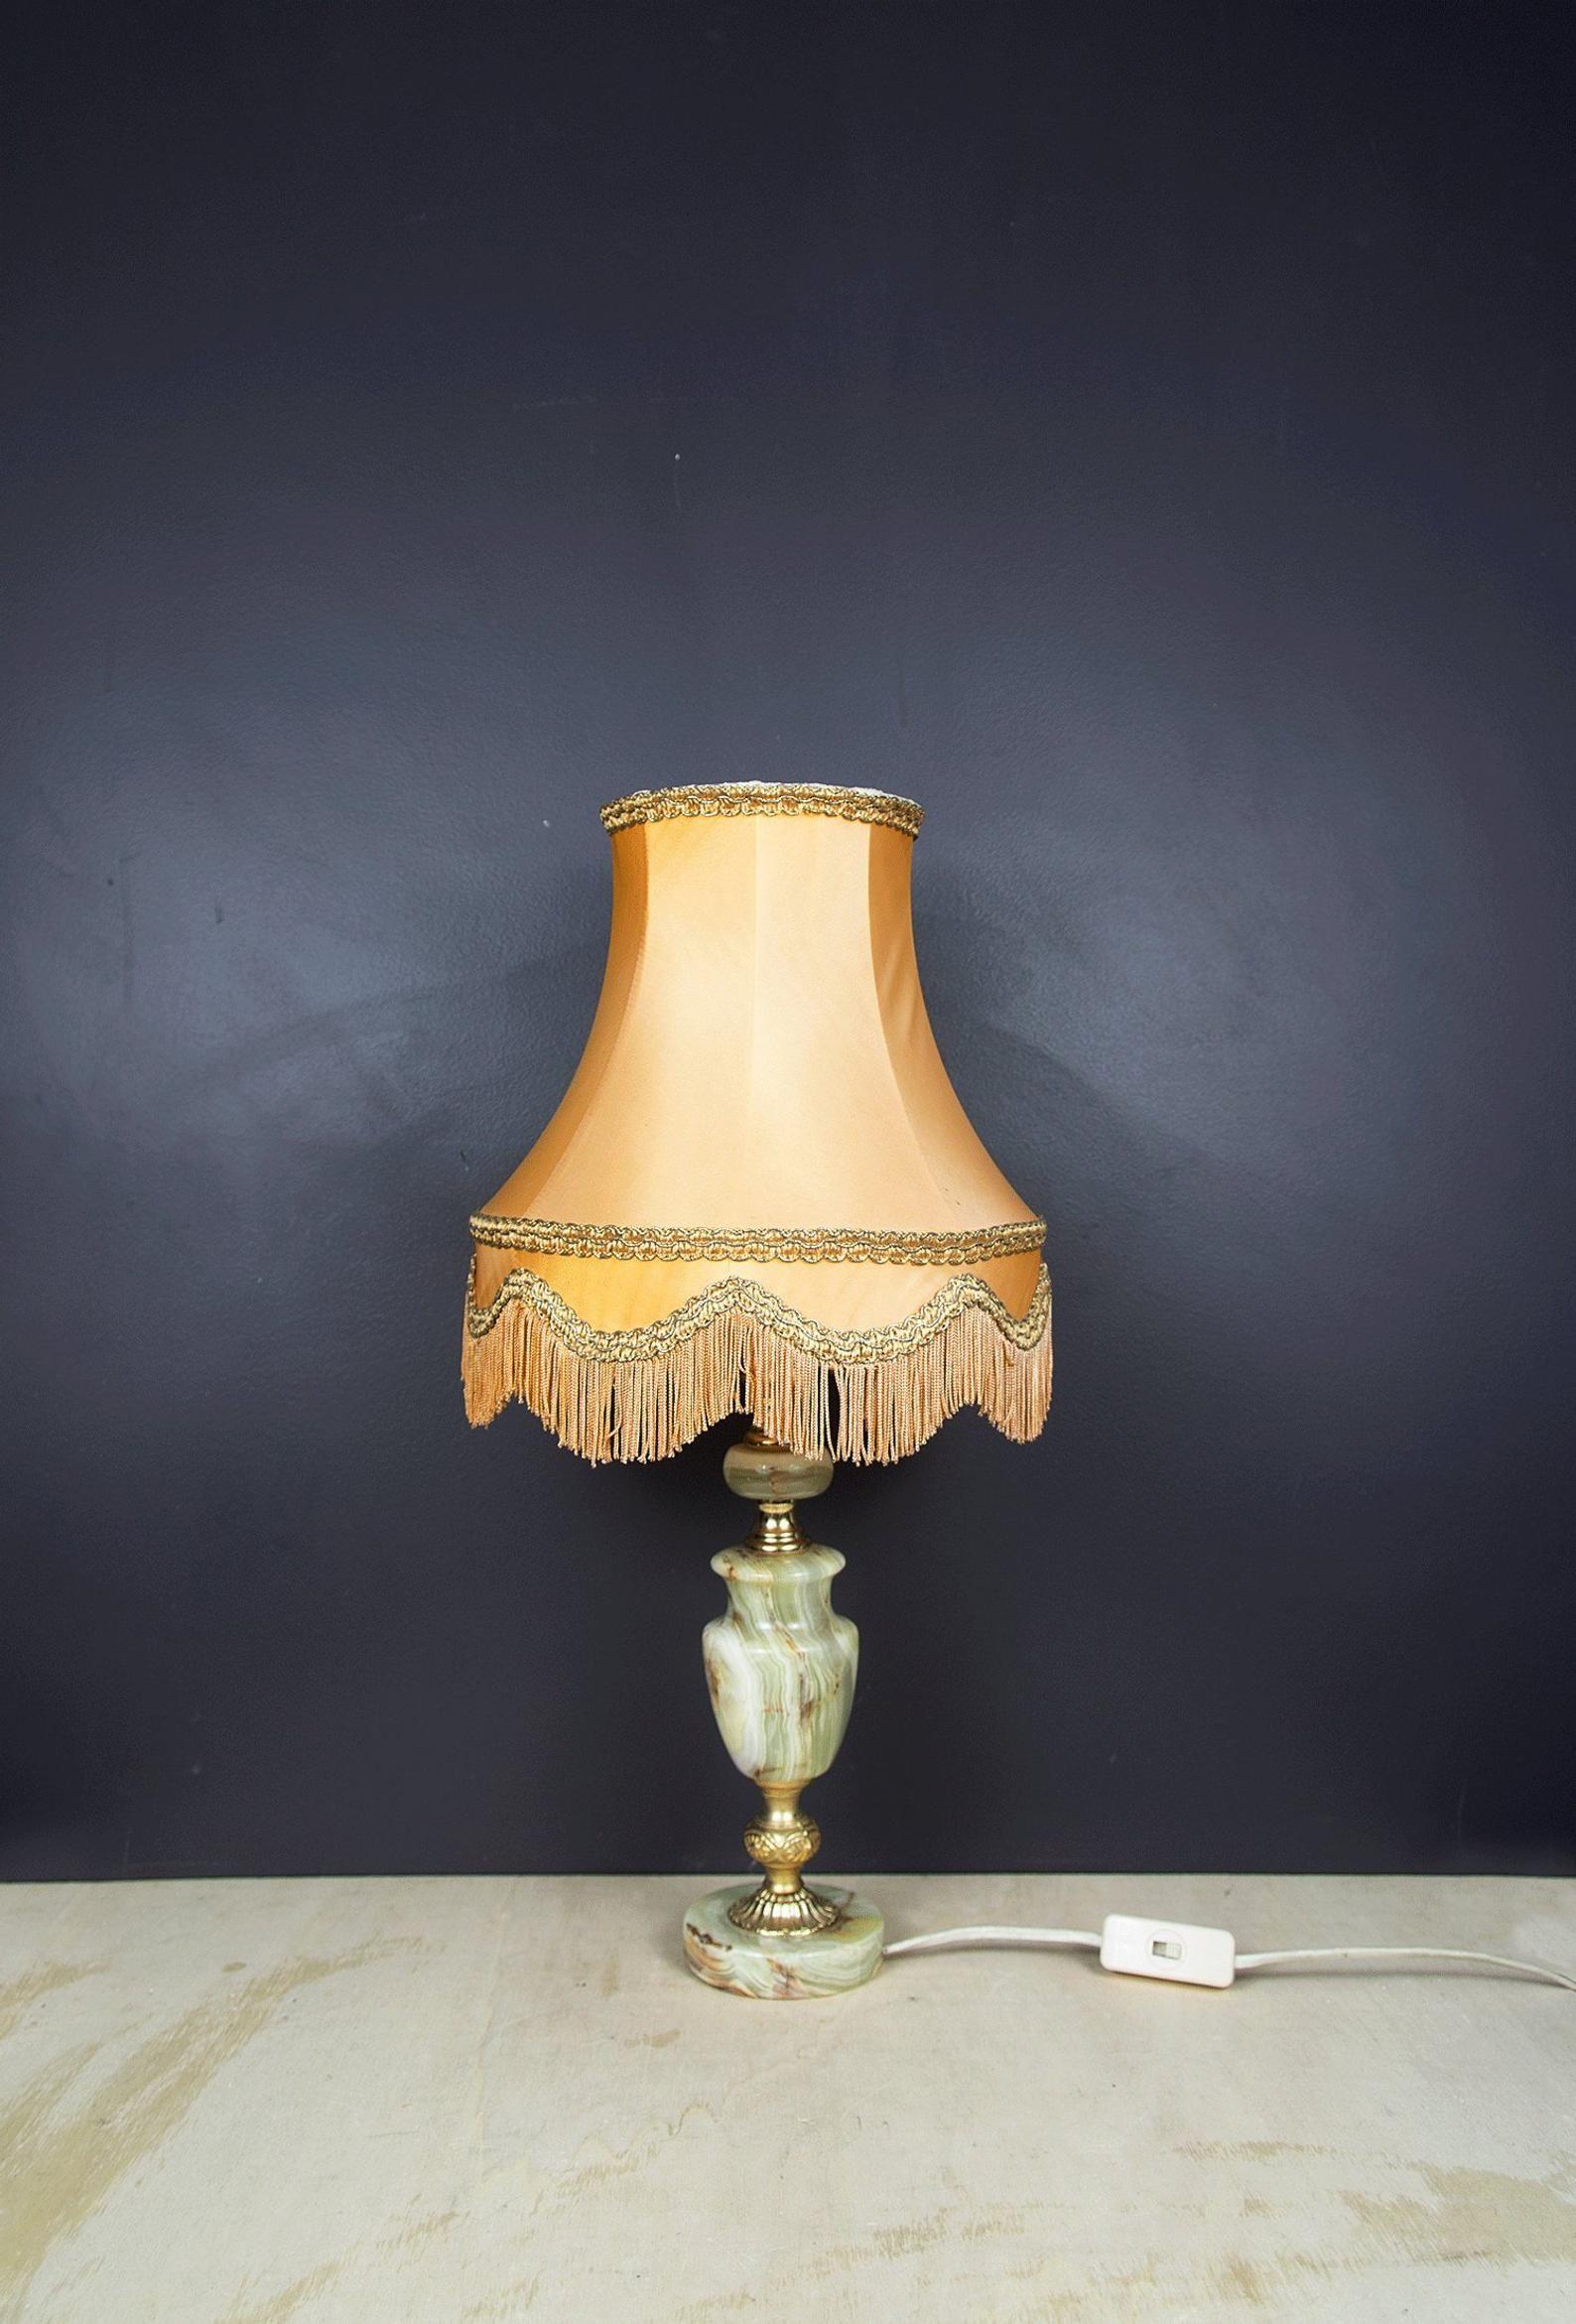 Vintage Table Lamp Onyx Table Lamp Boudoir Lamp Marble Lamp Etsy Vintage Table Lamp Table Lamp Marble Lamp